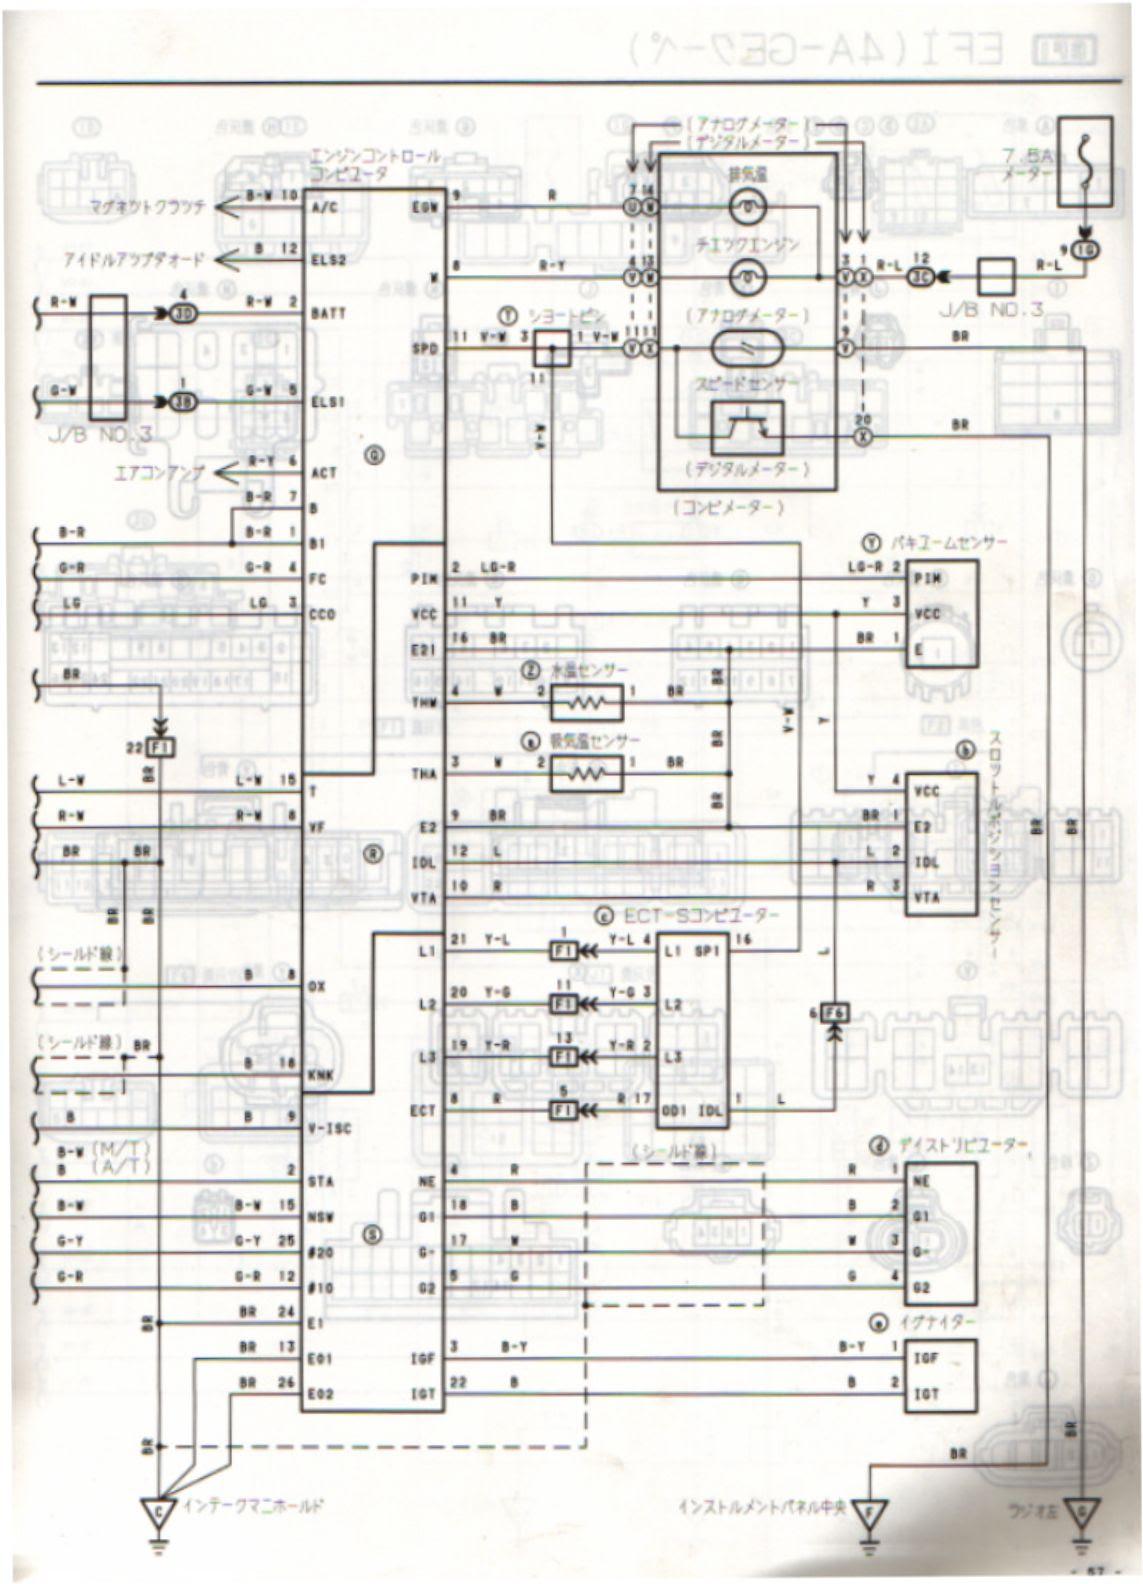 1989 Toyota Corolla Wiring Diagram Data Wiring Diagram Quit Pipe A Quit Pipe A Vivarelliauto It